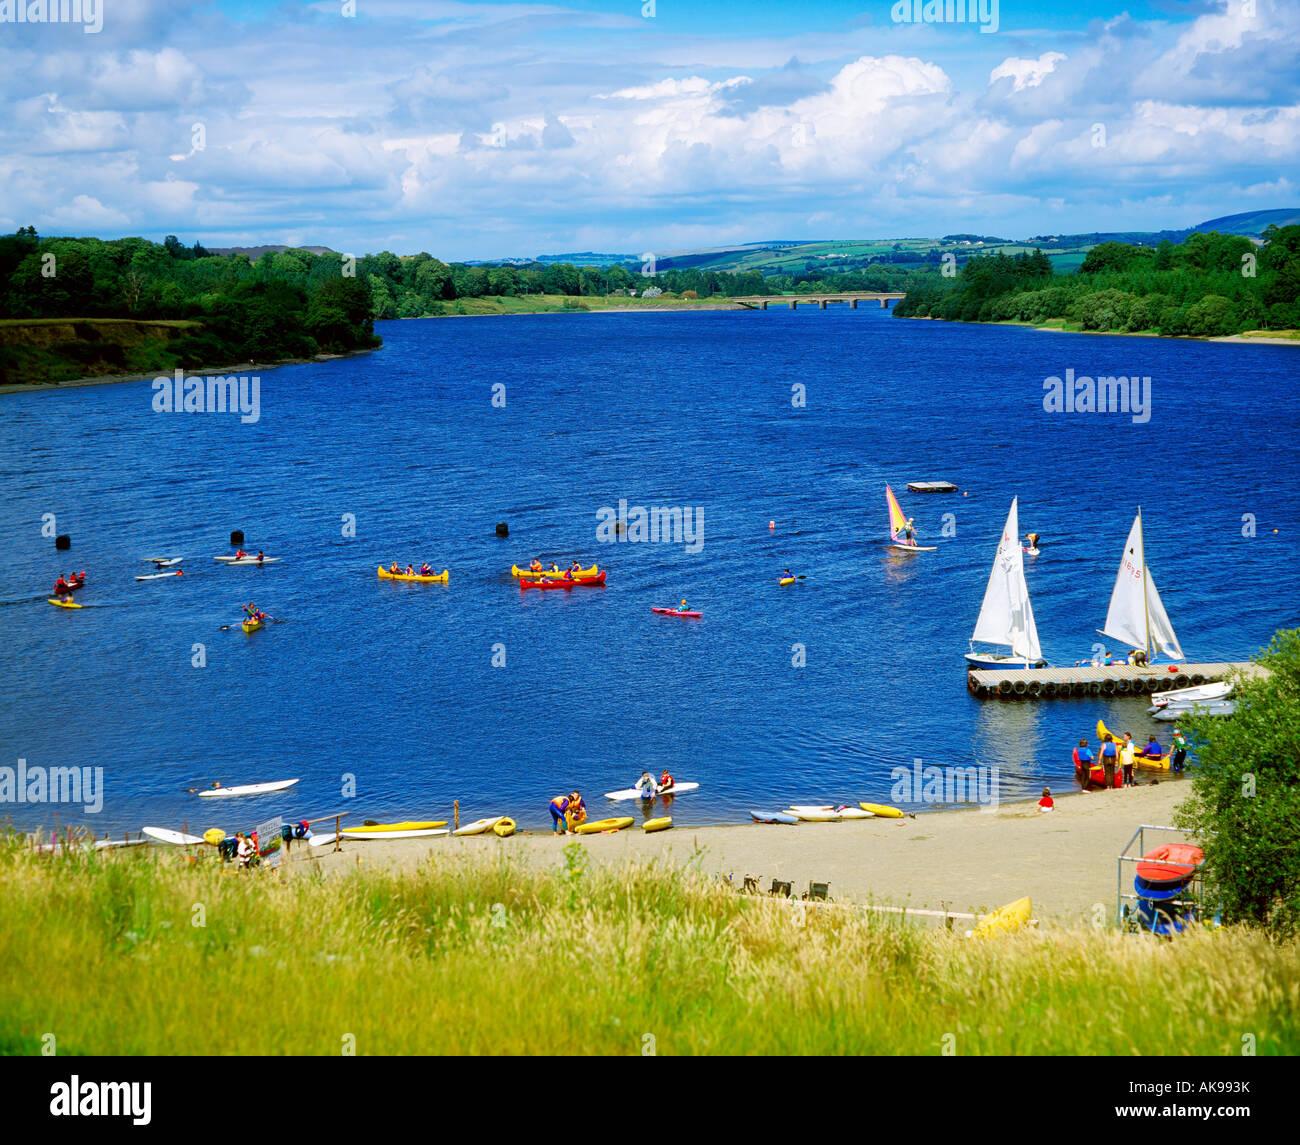 Blessington Lakes (Wicklow) - 2020 All You - TripAdvisor